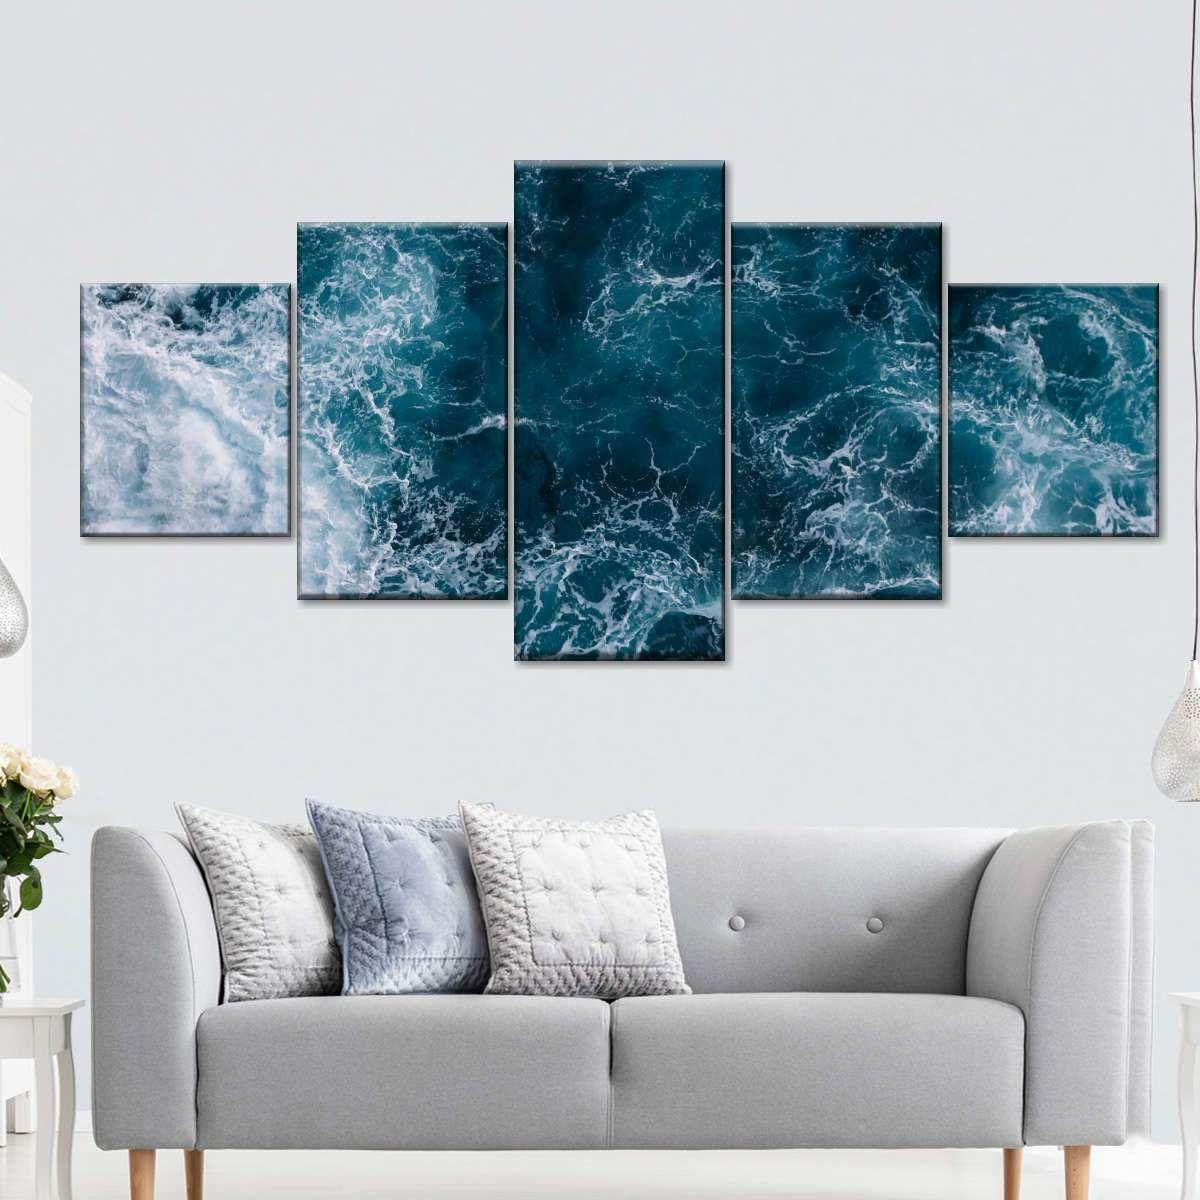 Blue Ocean Waves Multi Panel Canvas Wall Art Wall Canvas Canvas Wall Art Ocean Wall Art